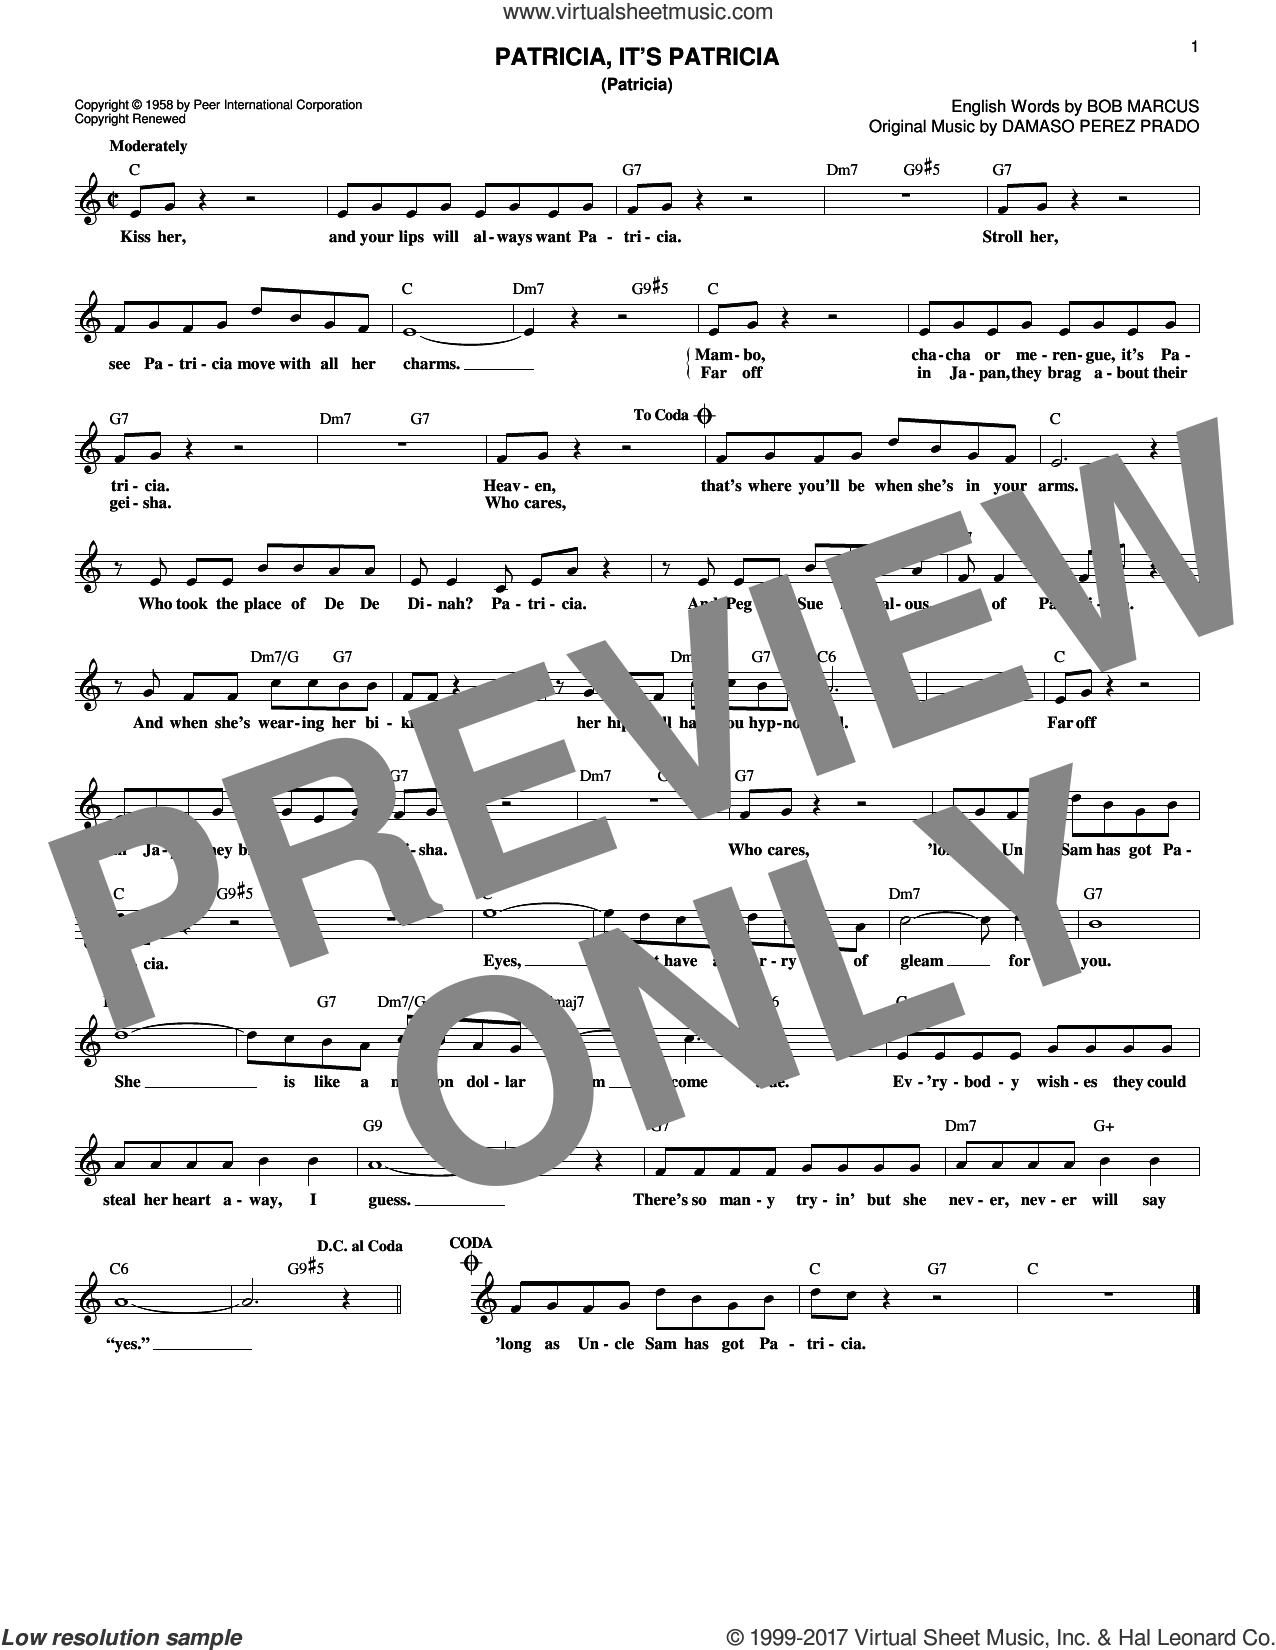 Patricia, It's Patricia (Patricia) sheet music for voice and other instruments (fake book) by Damaso Perez Prado, Perez Prado and Bob Marcus, intermediate skill level